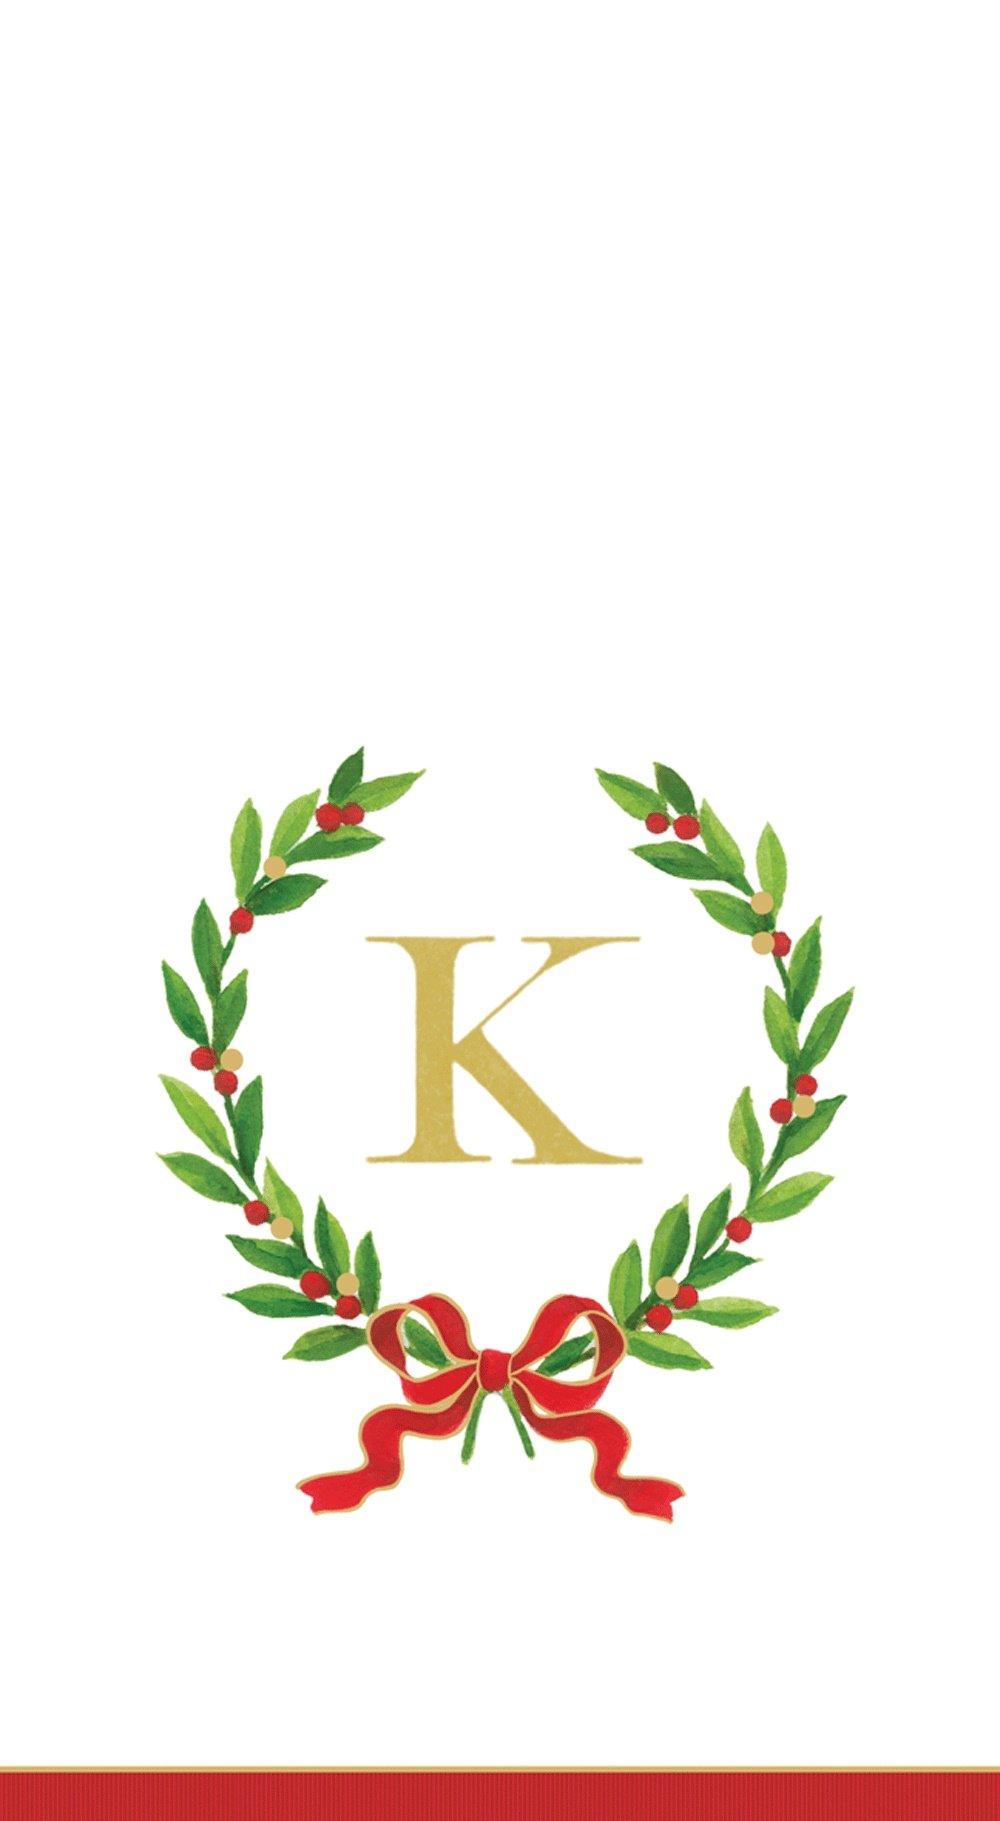 Entertaining with Caspari Christmas Laurel Wreath Paper Guest Towels, Monogram Initial K, Pack of 15